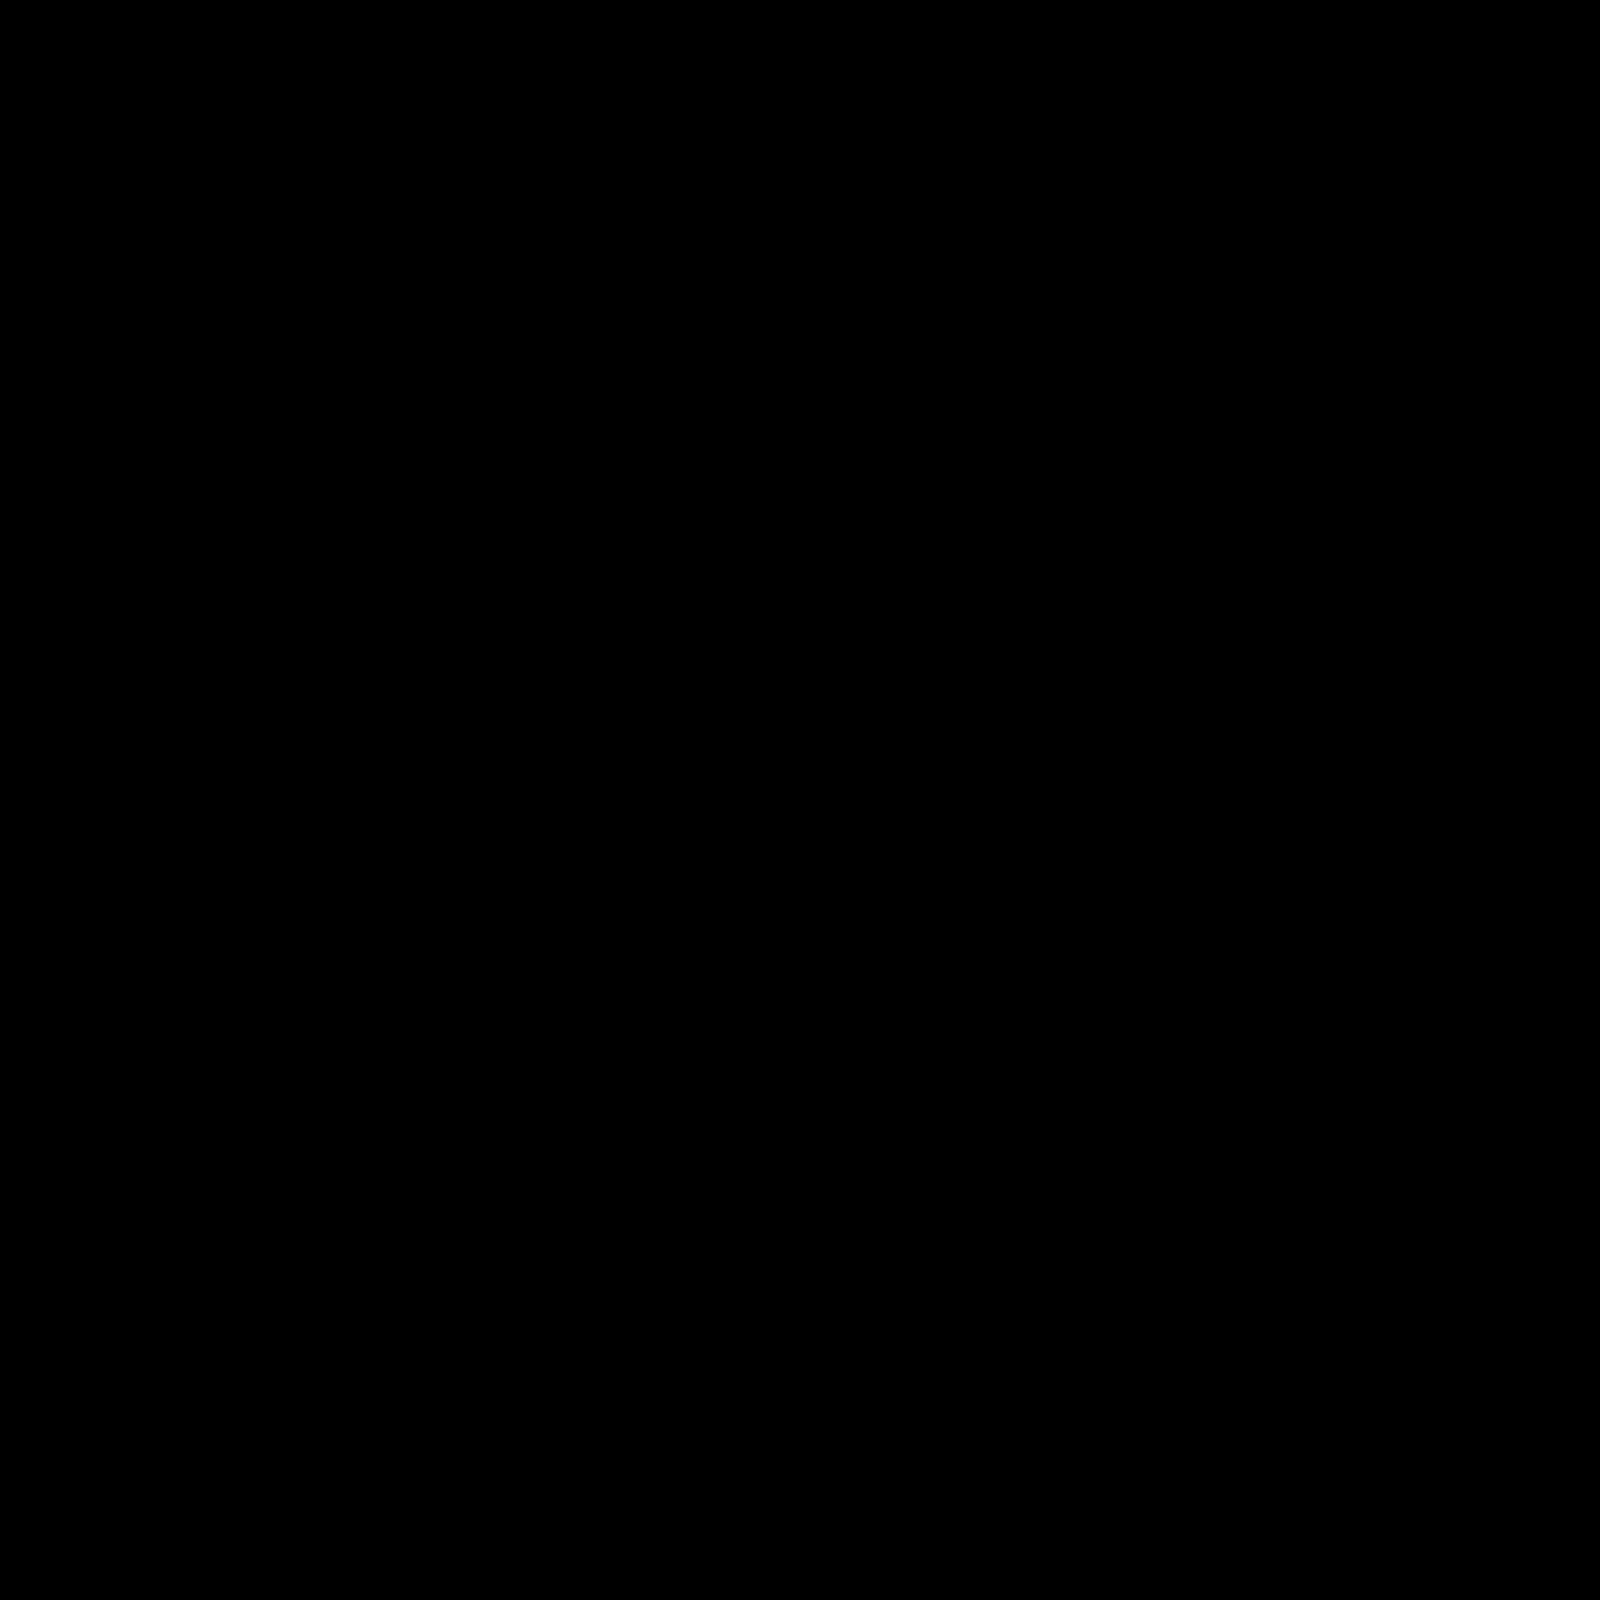 Pixar icon